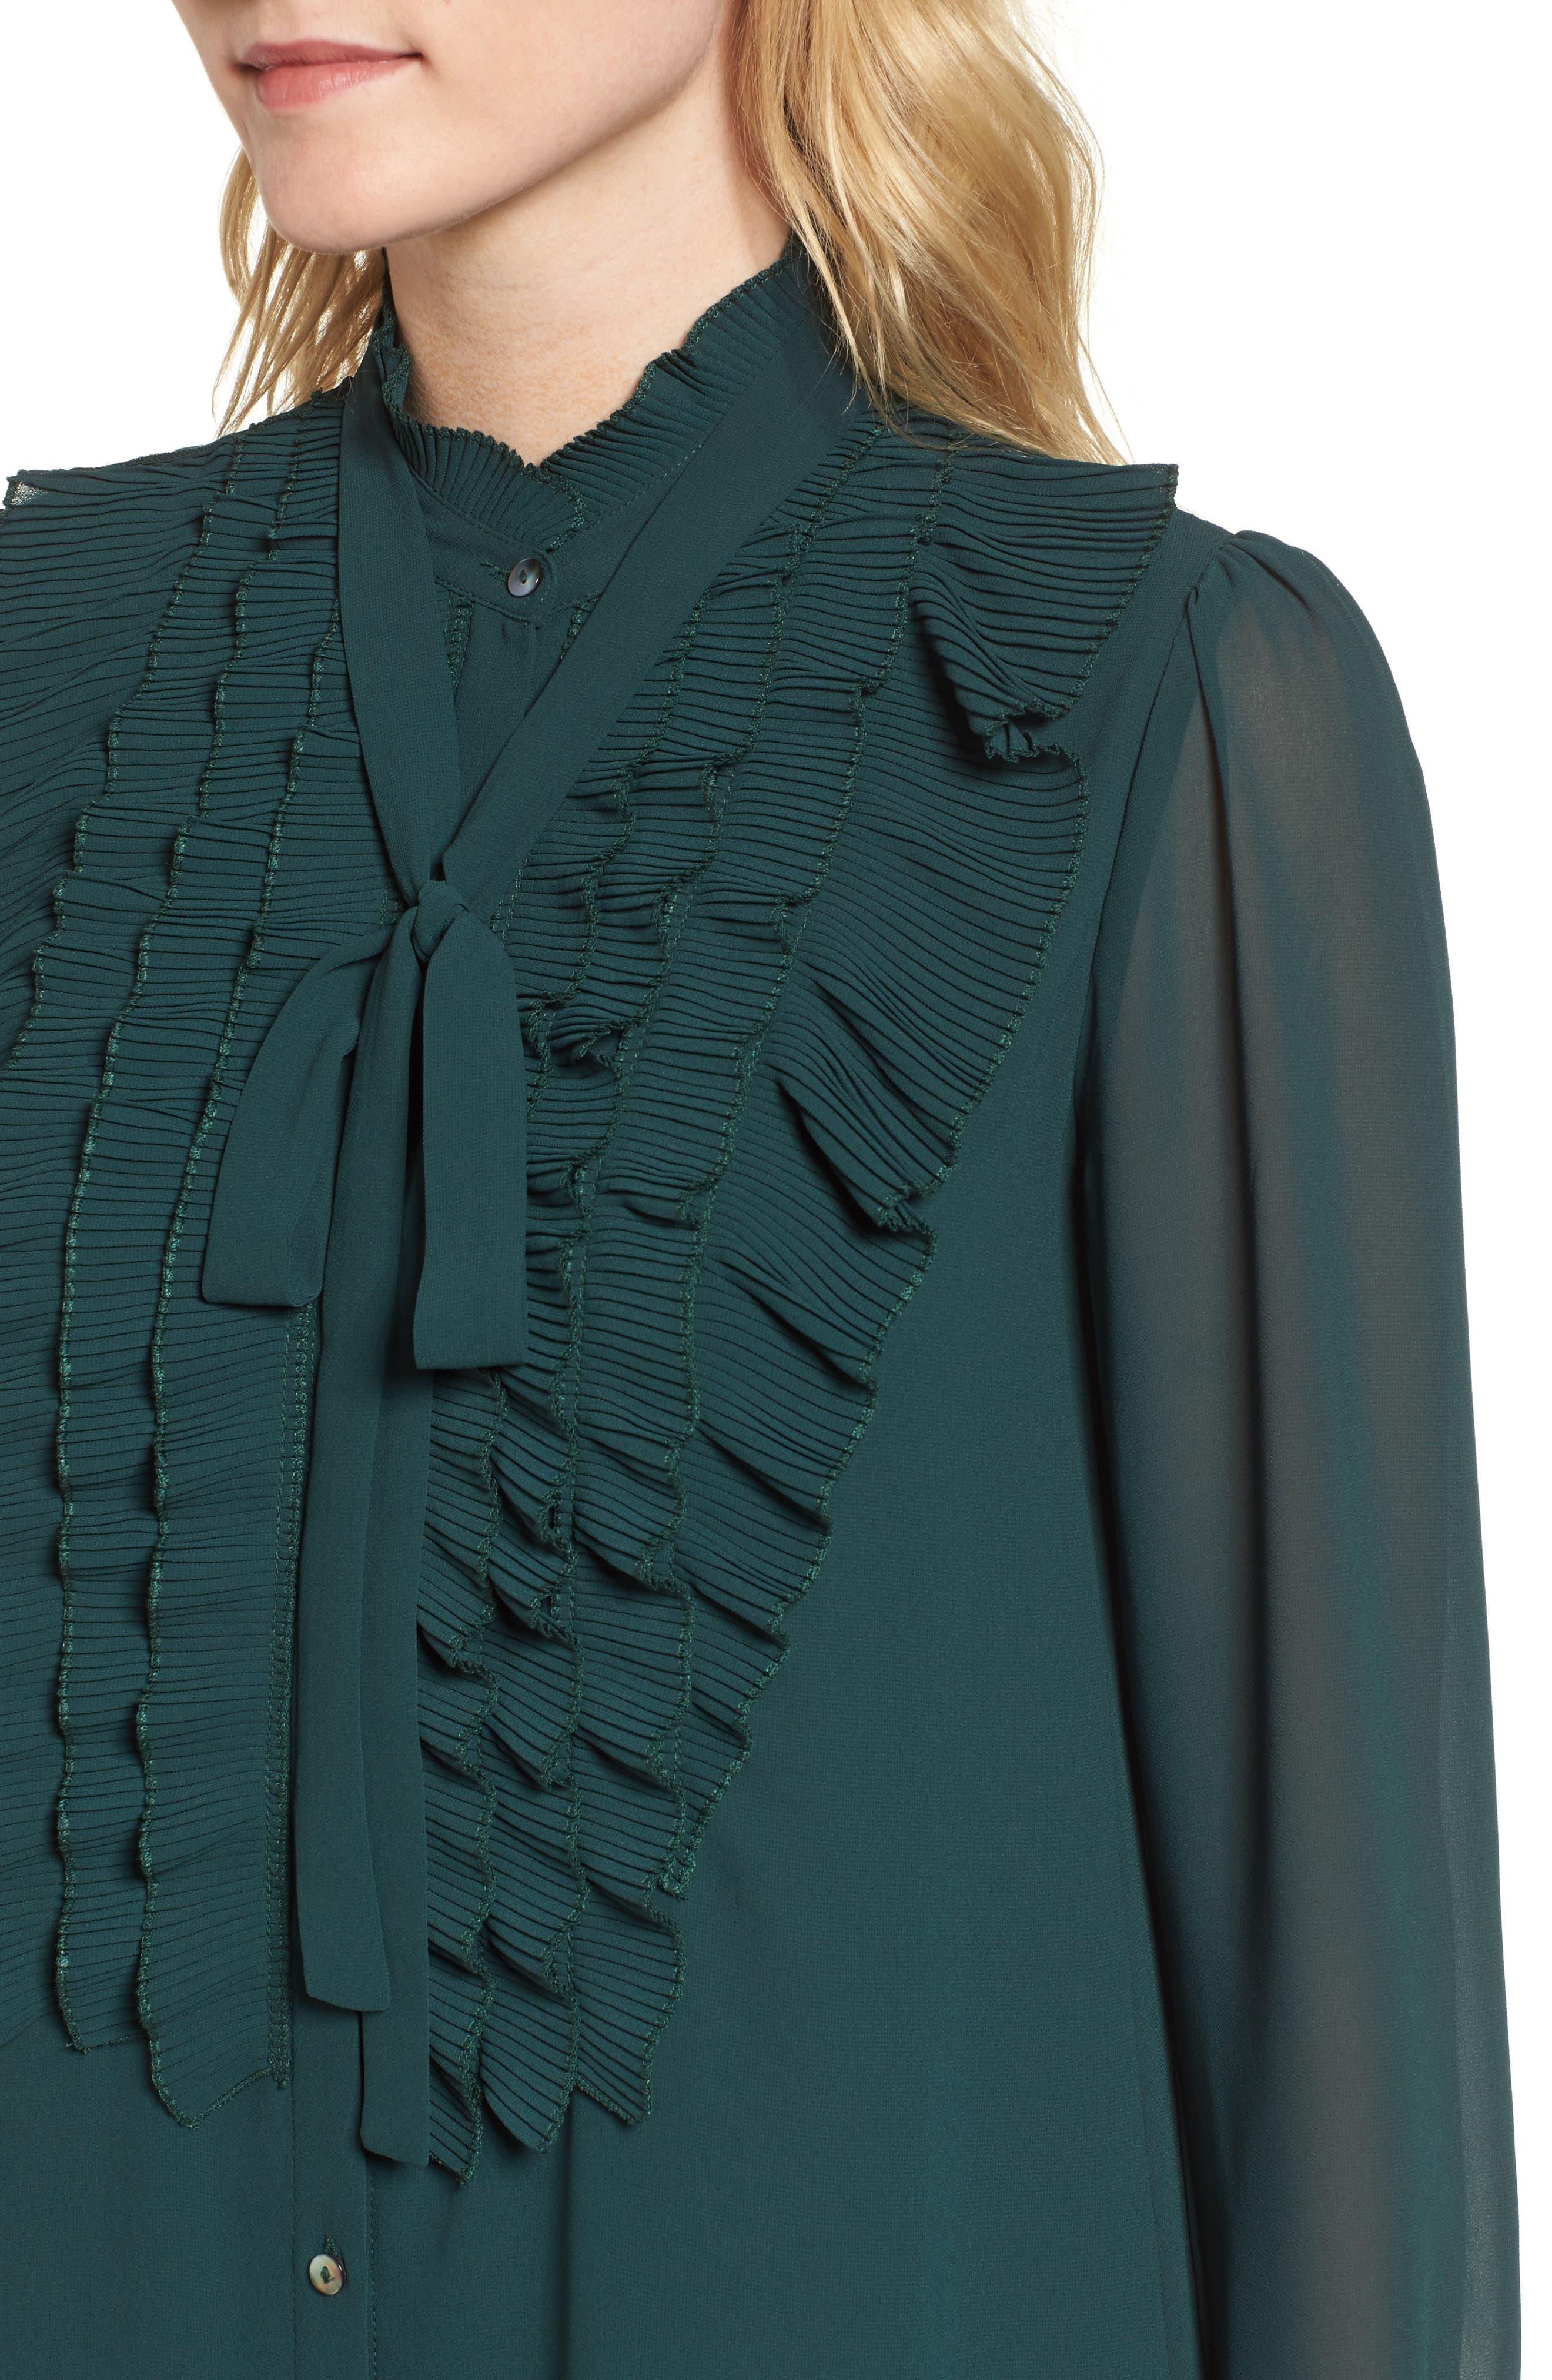 Near Death Ruffle Shirtdress,                             Alternate thumbnail 4, color,                             Pine